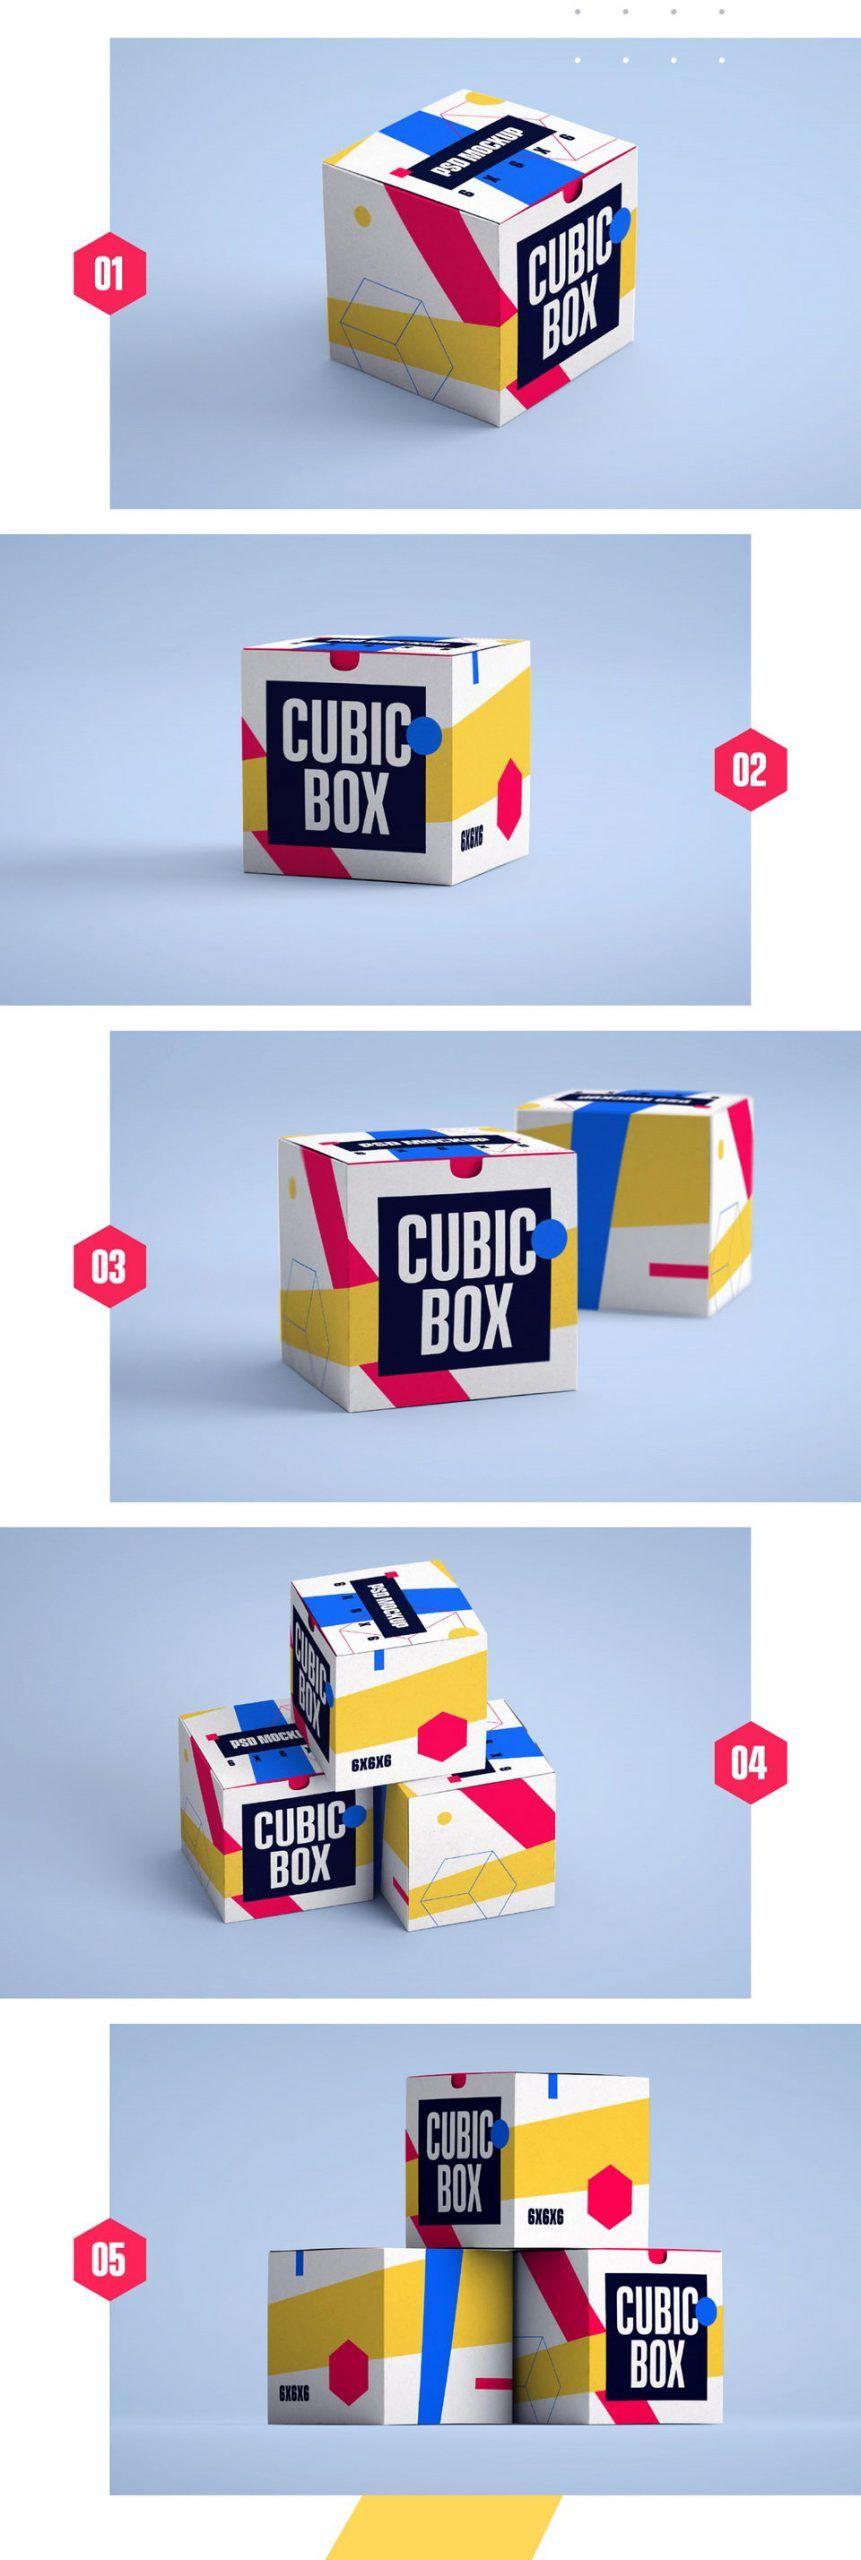 Download 5 Cubic Box Mockups Box Mockup Box Packaging Design Free Packaging Mockup